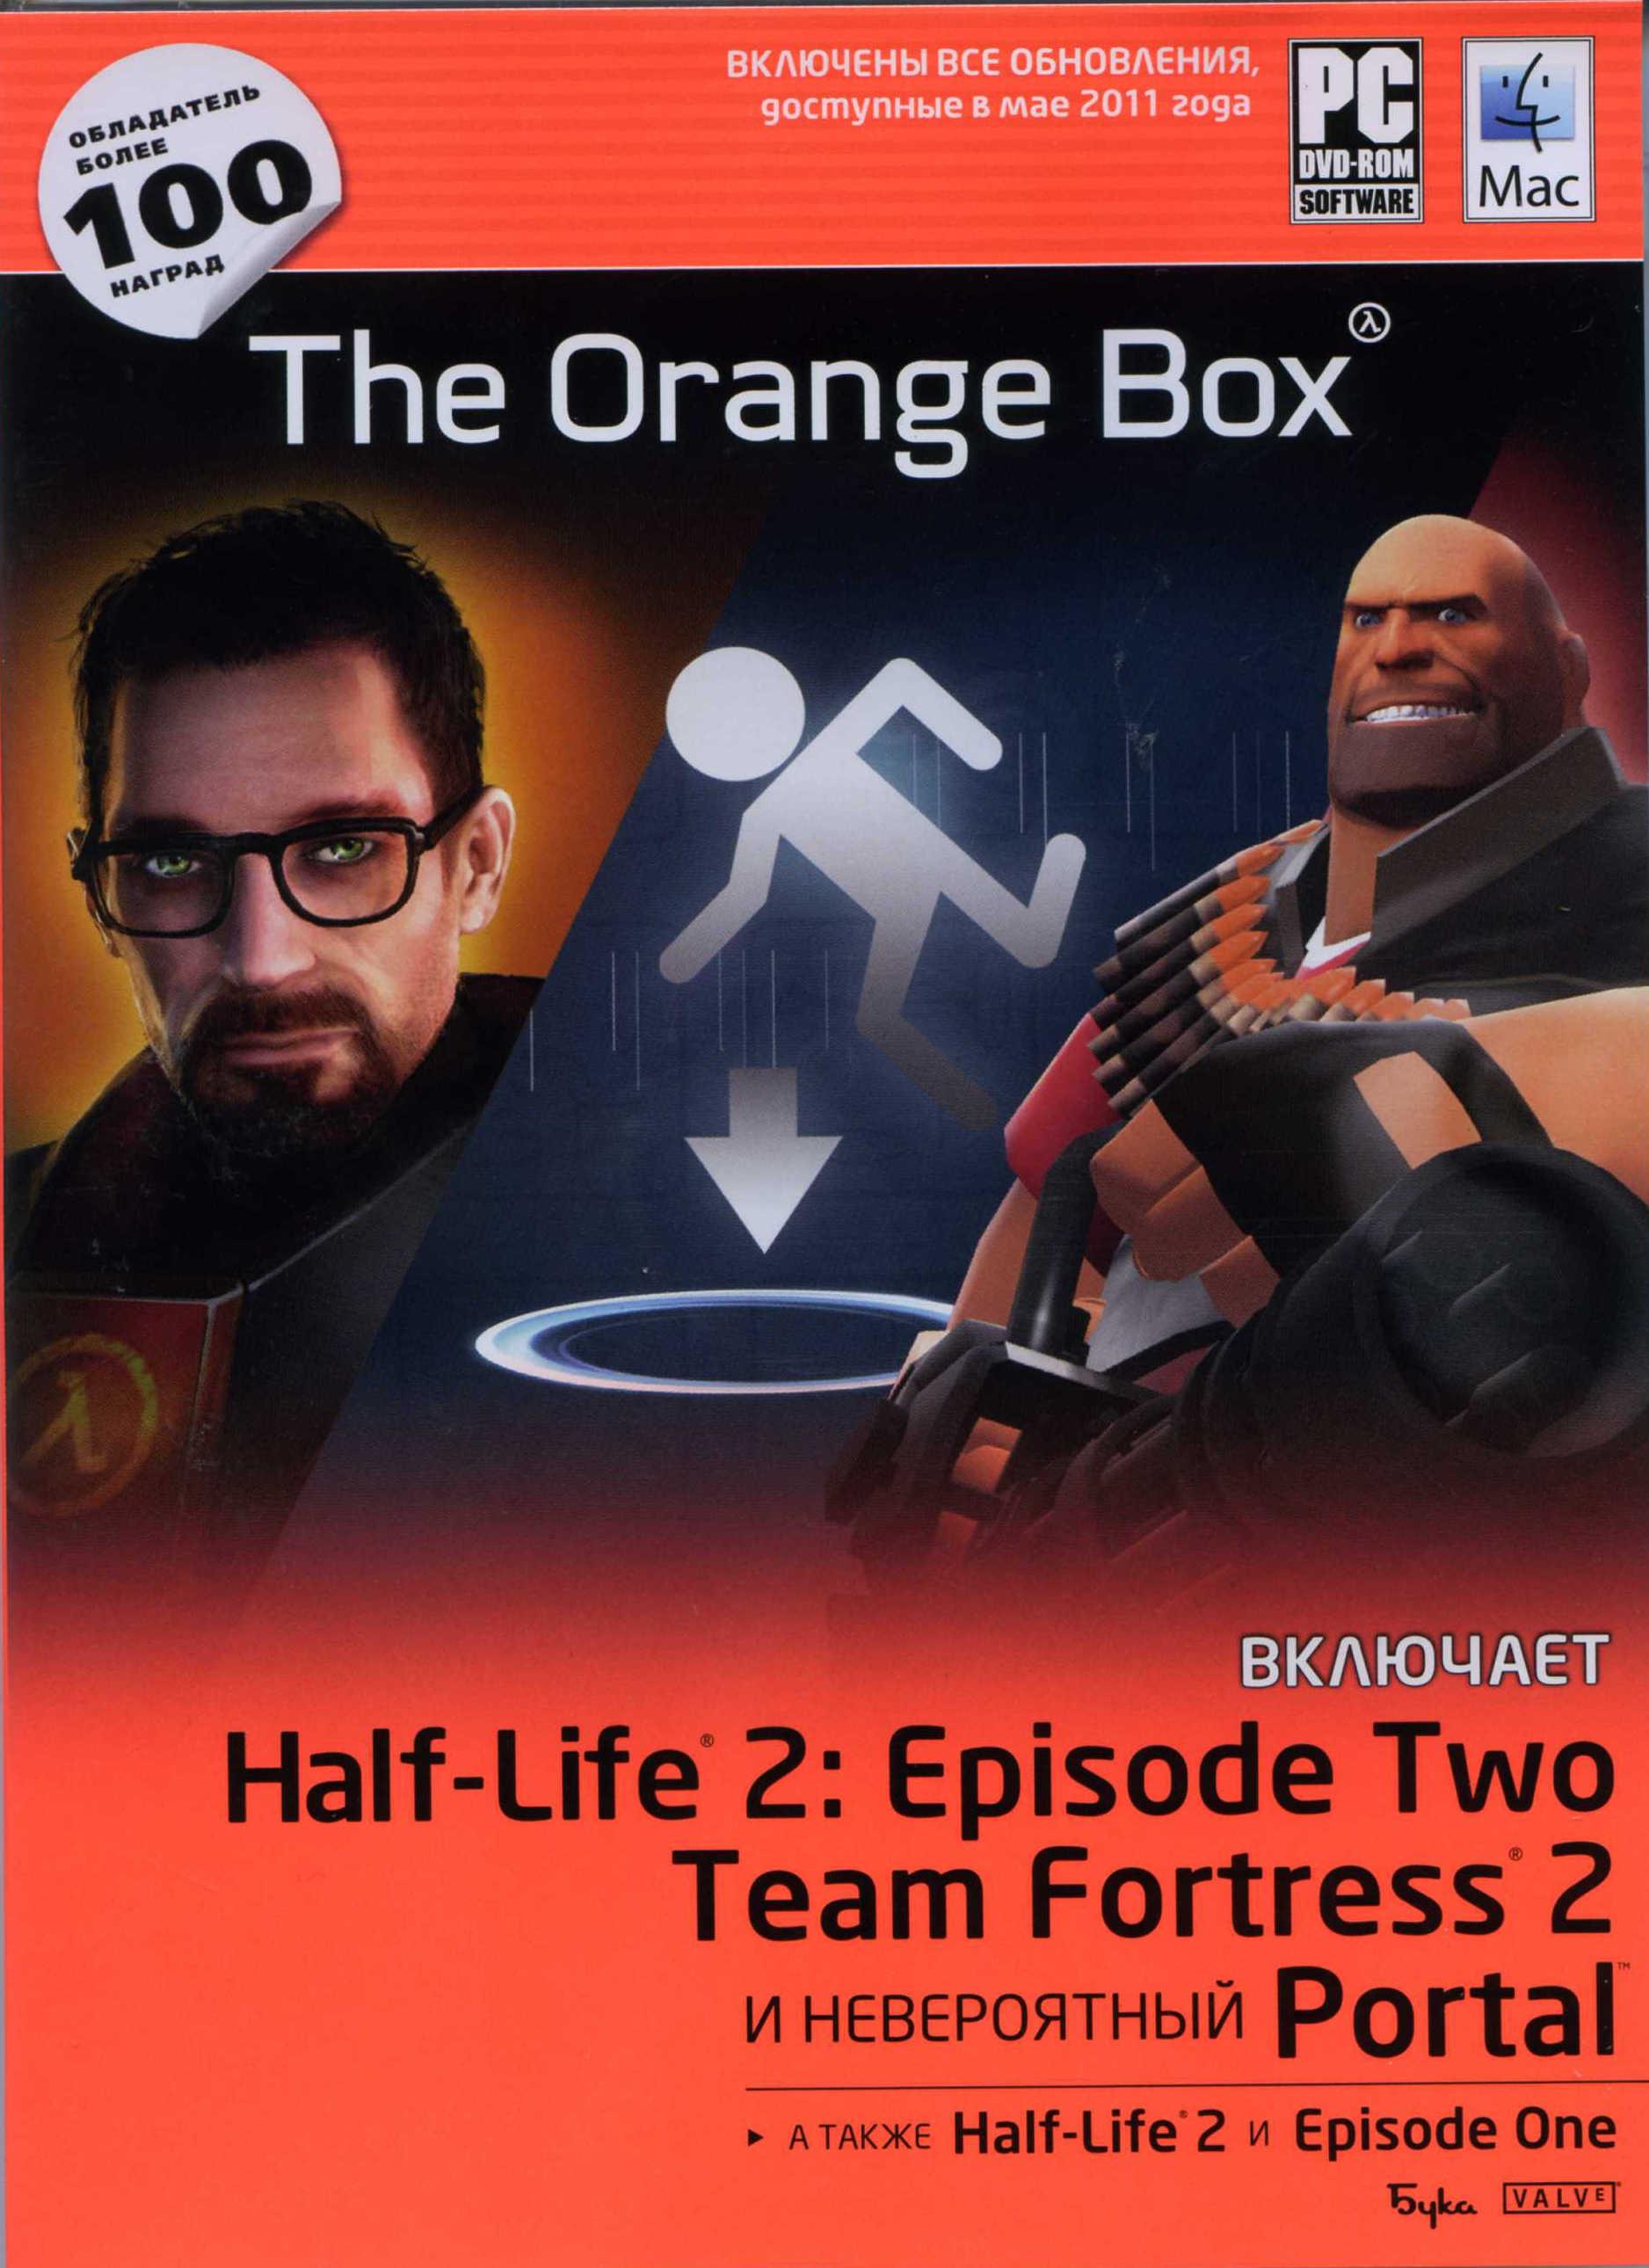 Buy Half-Life 2: The Orange Box (Steam) Buka and download